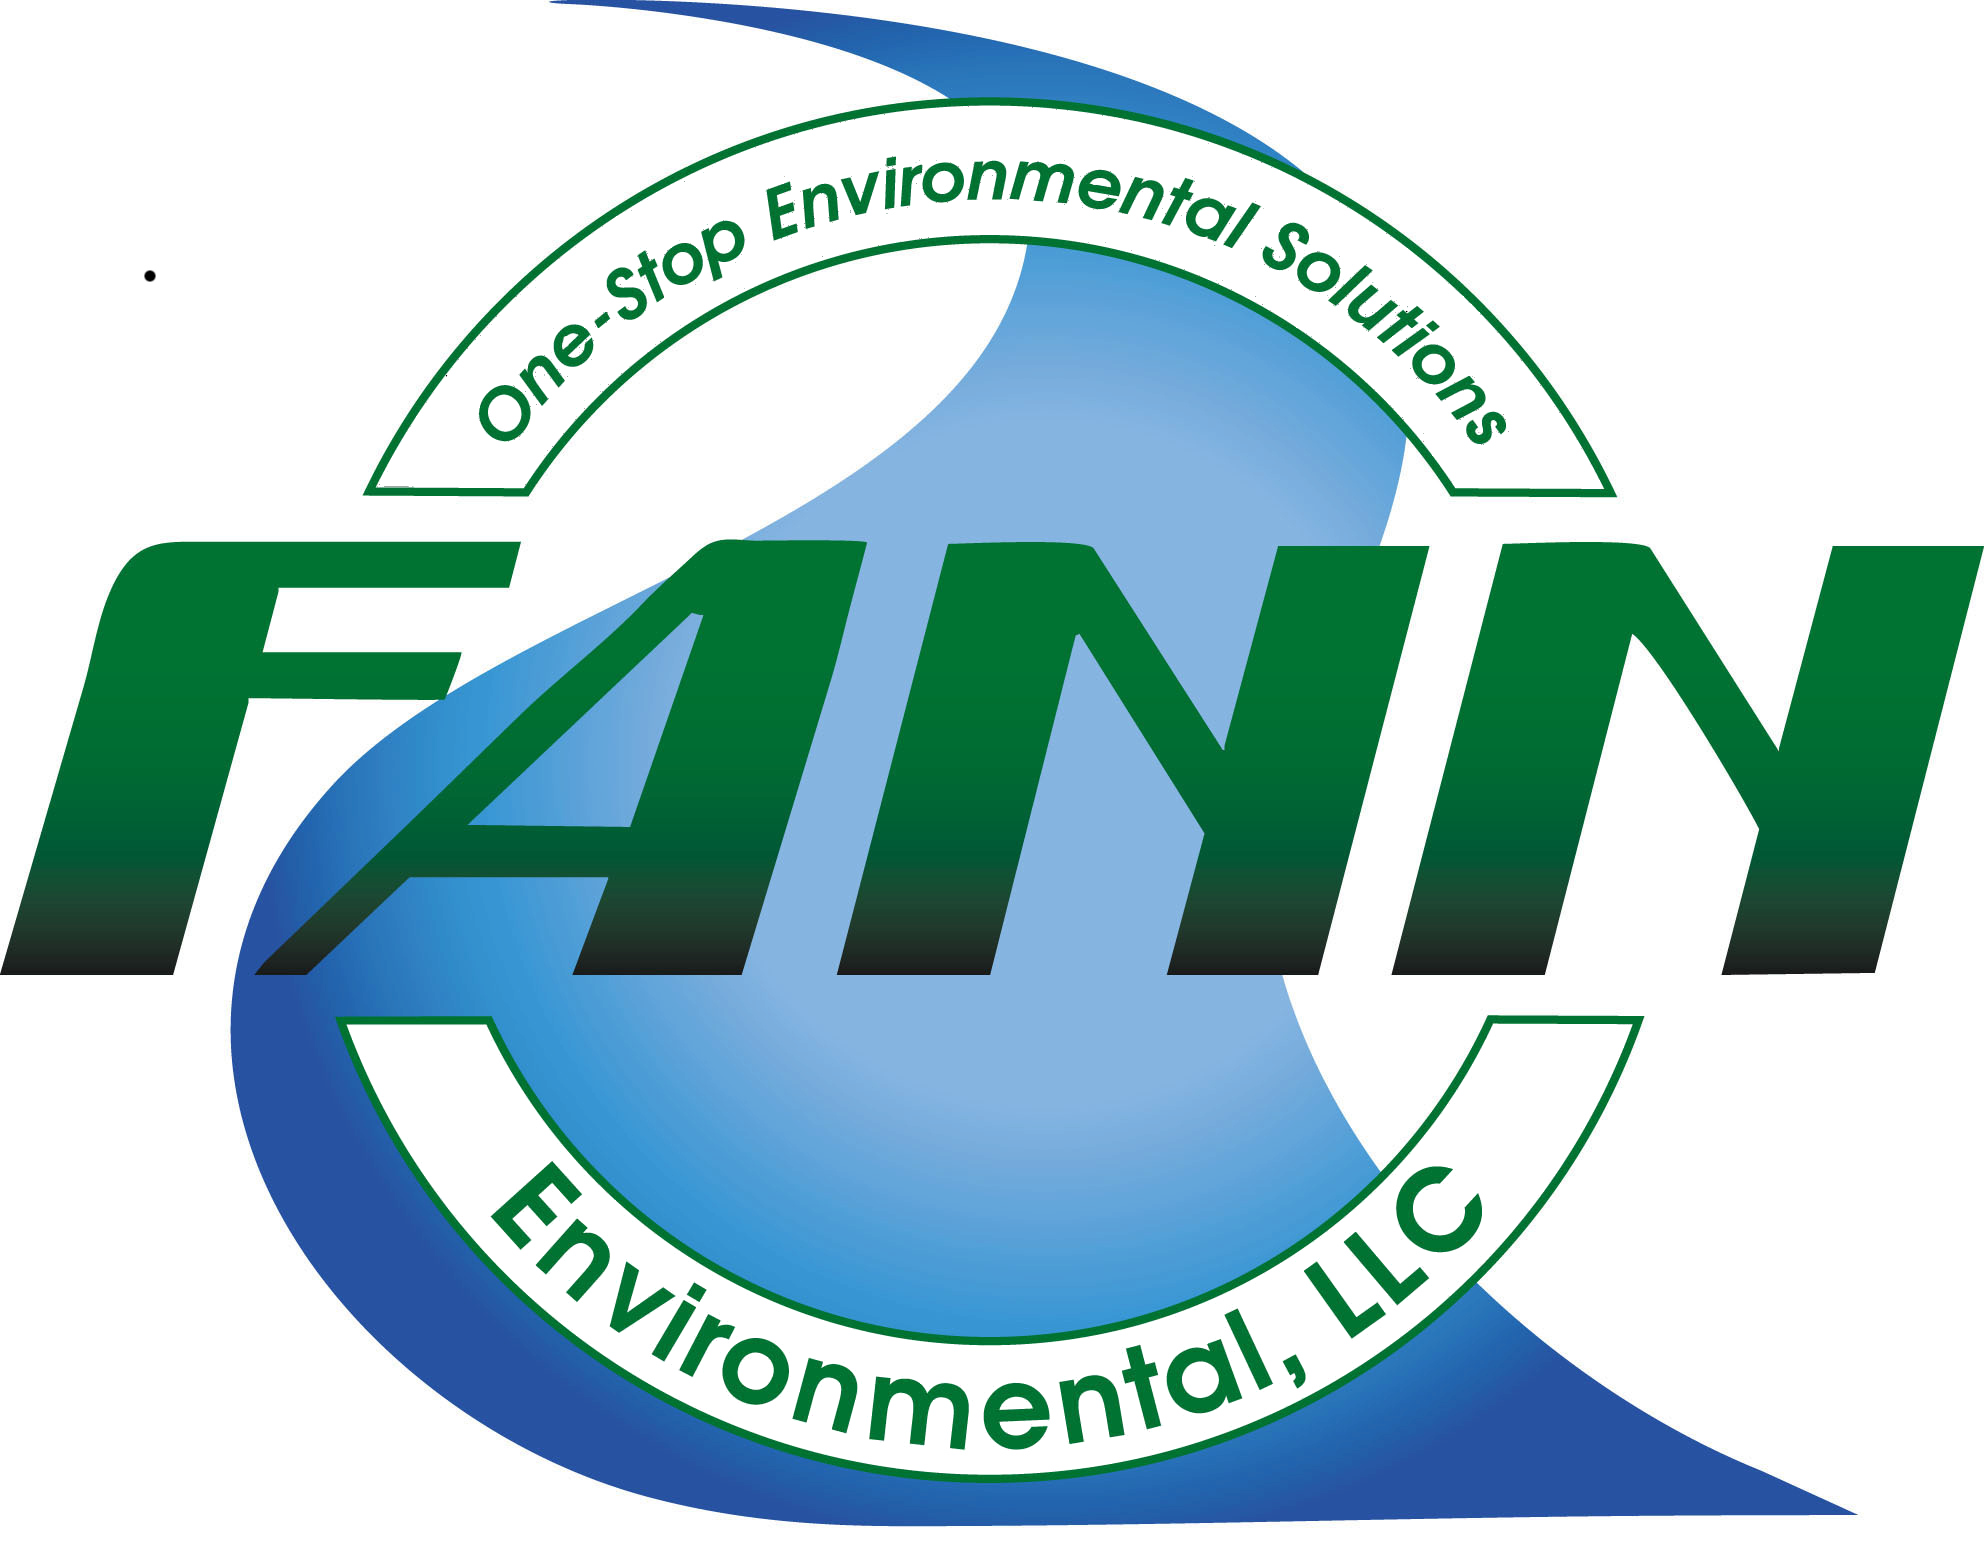 Fann Environmental